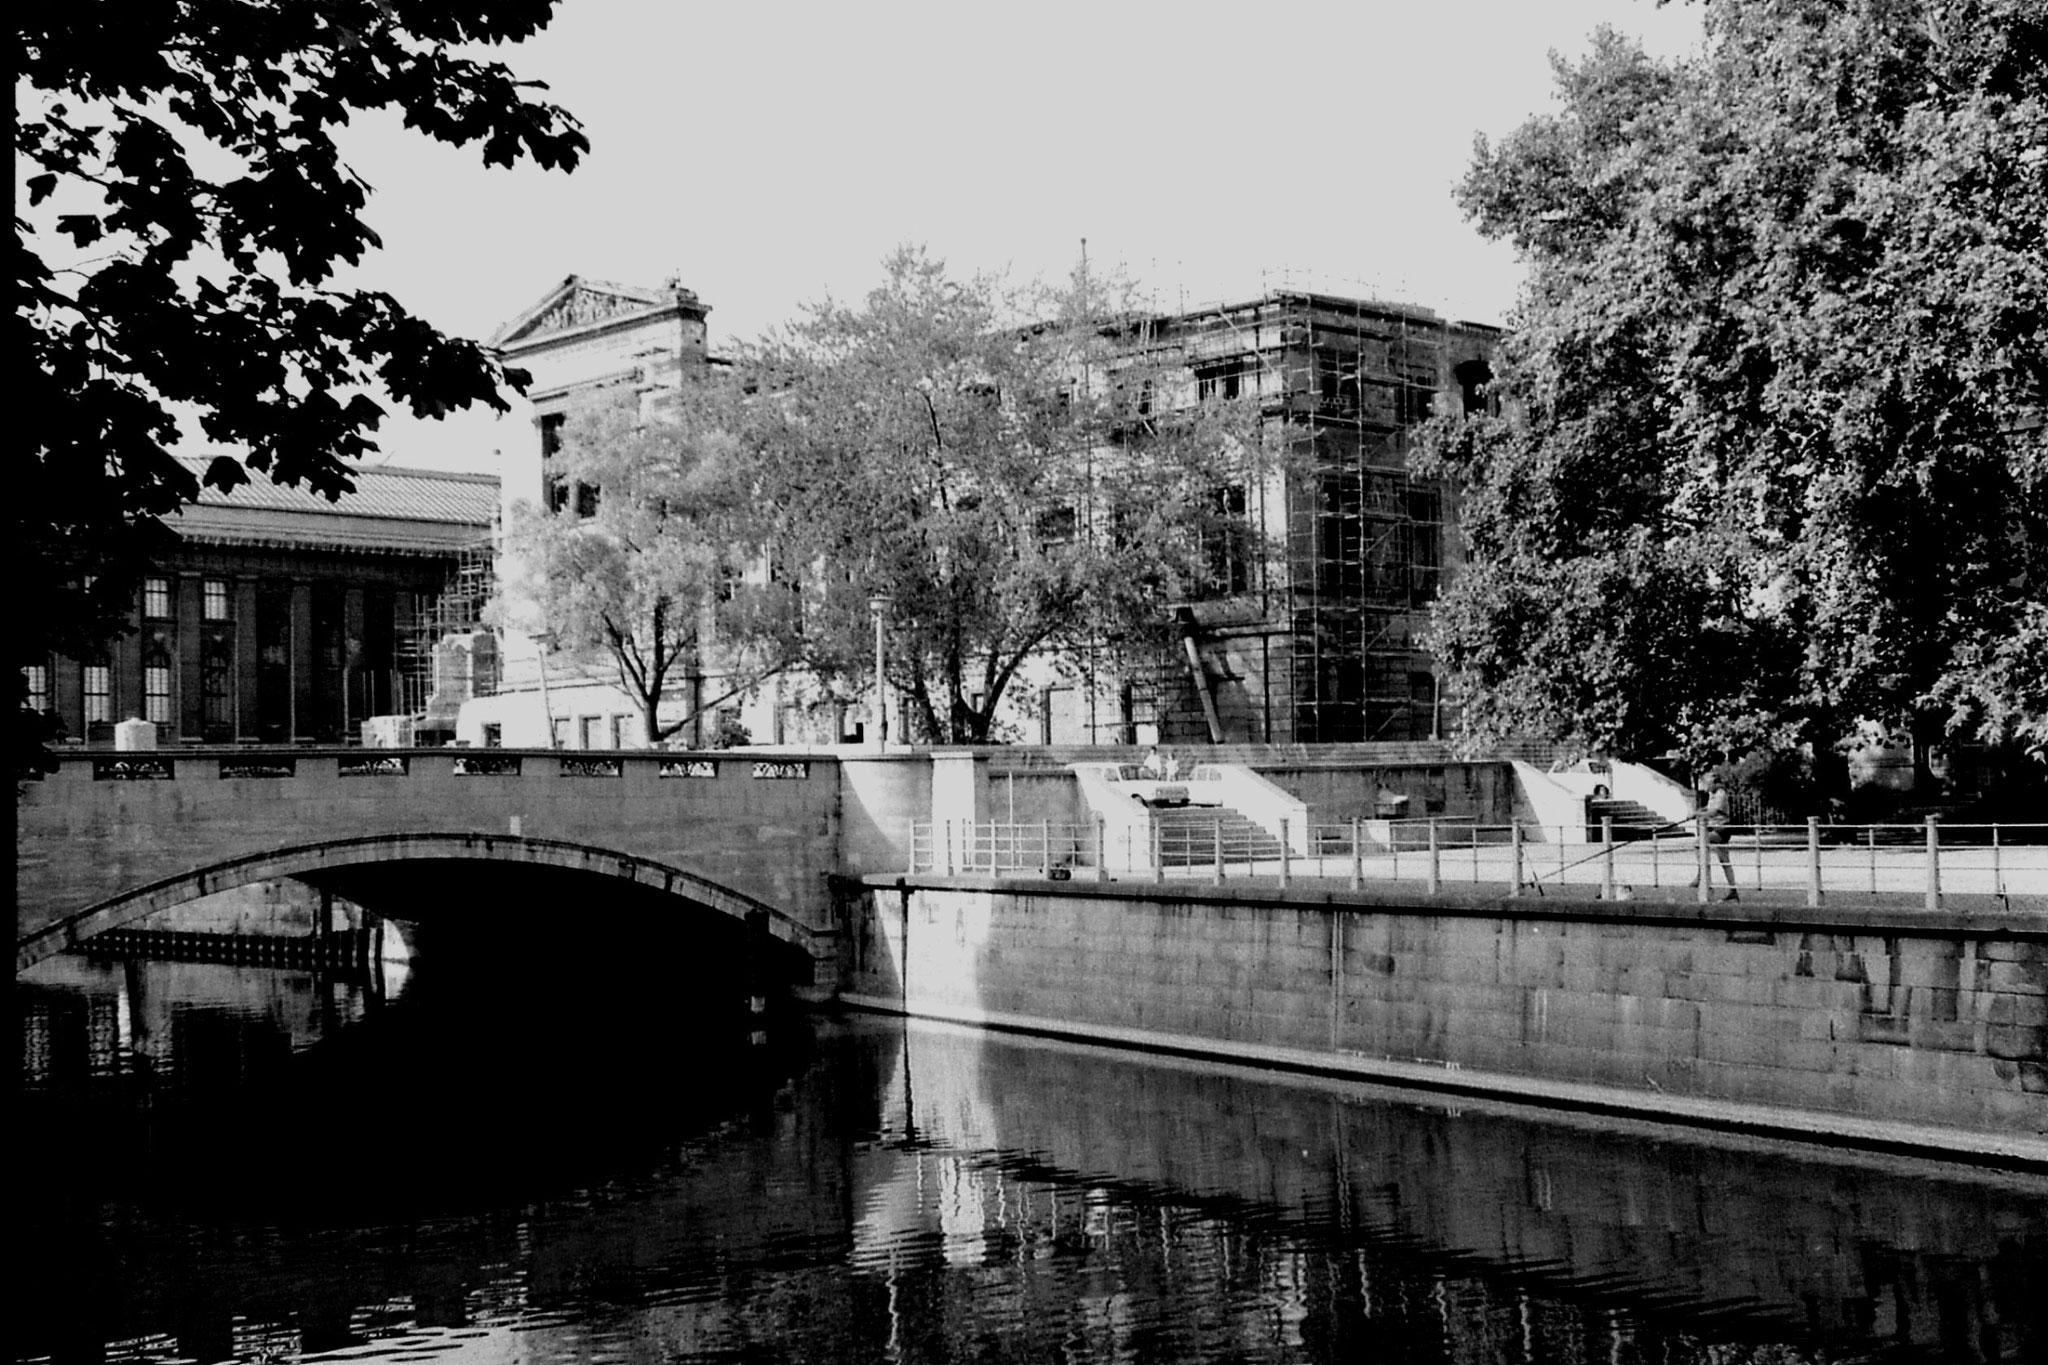 18/8/88: 1: Berlin, Neues Museum